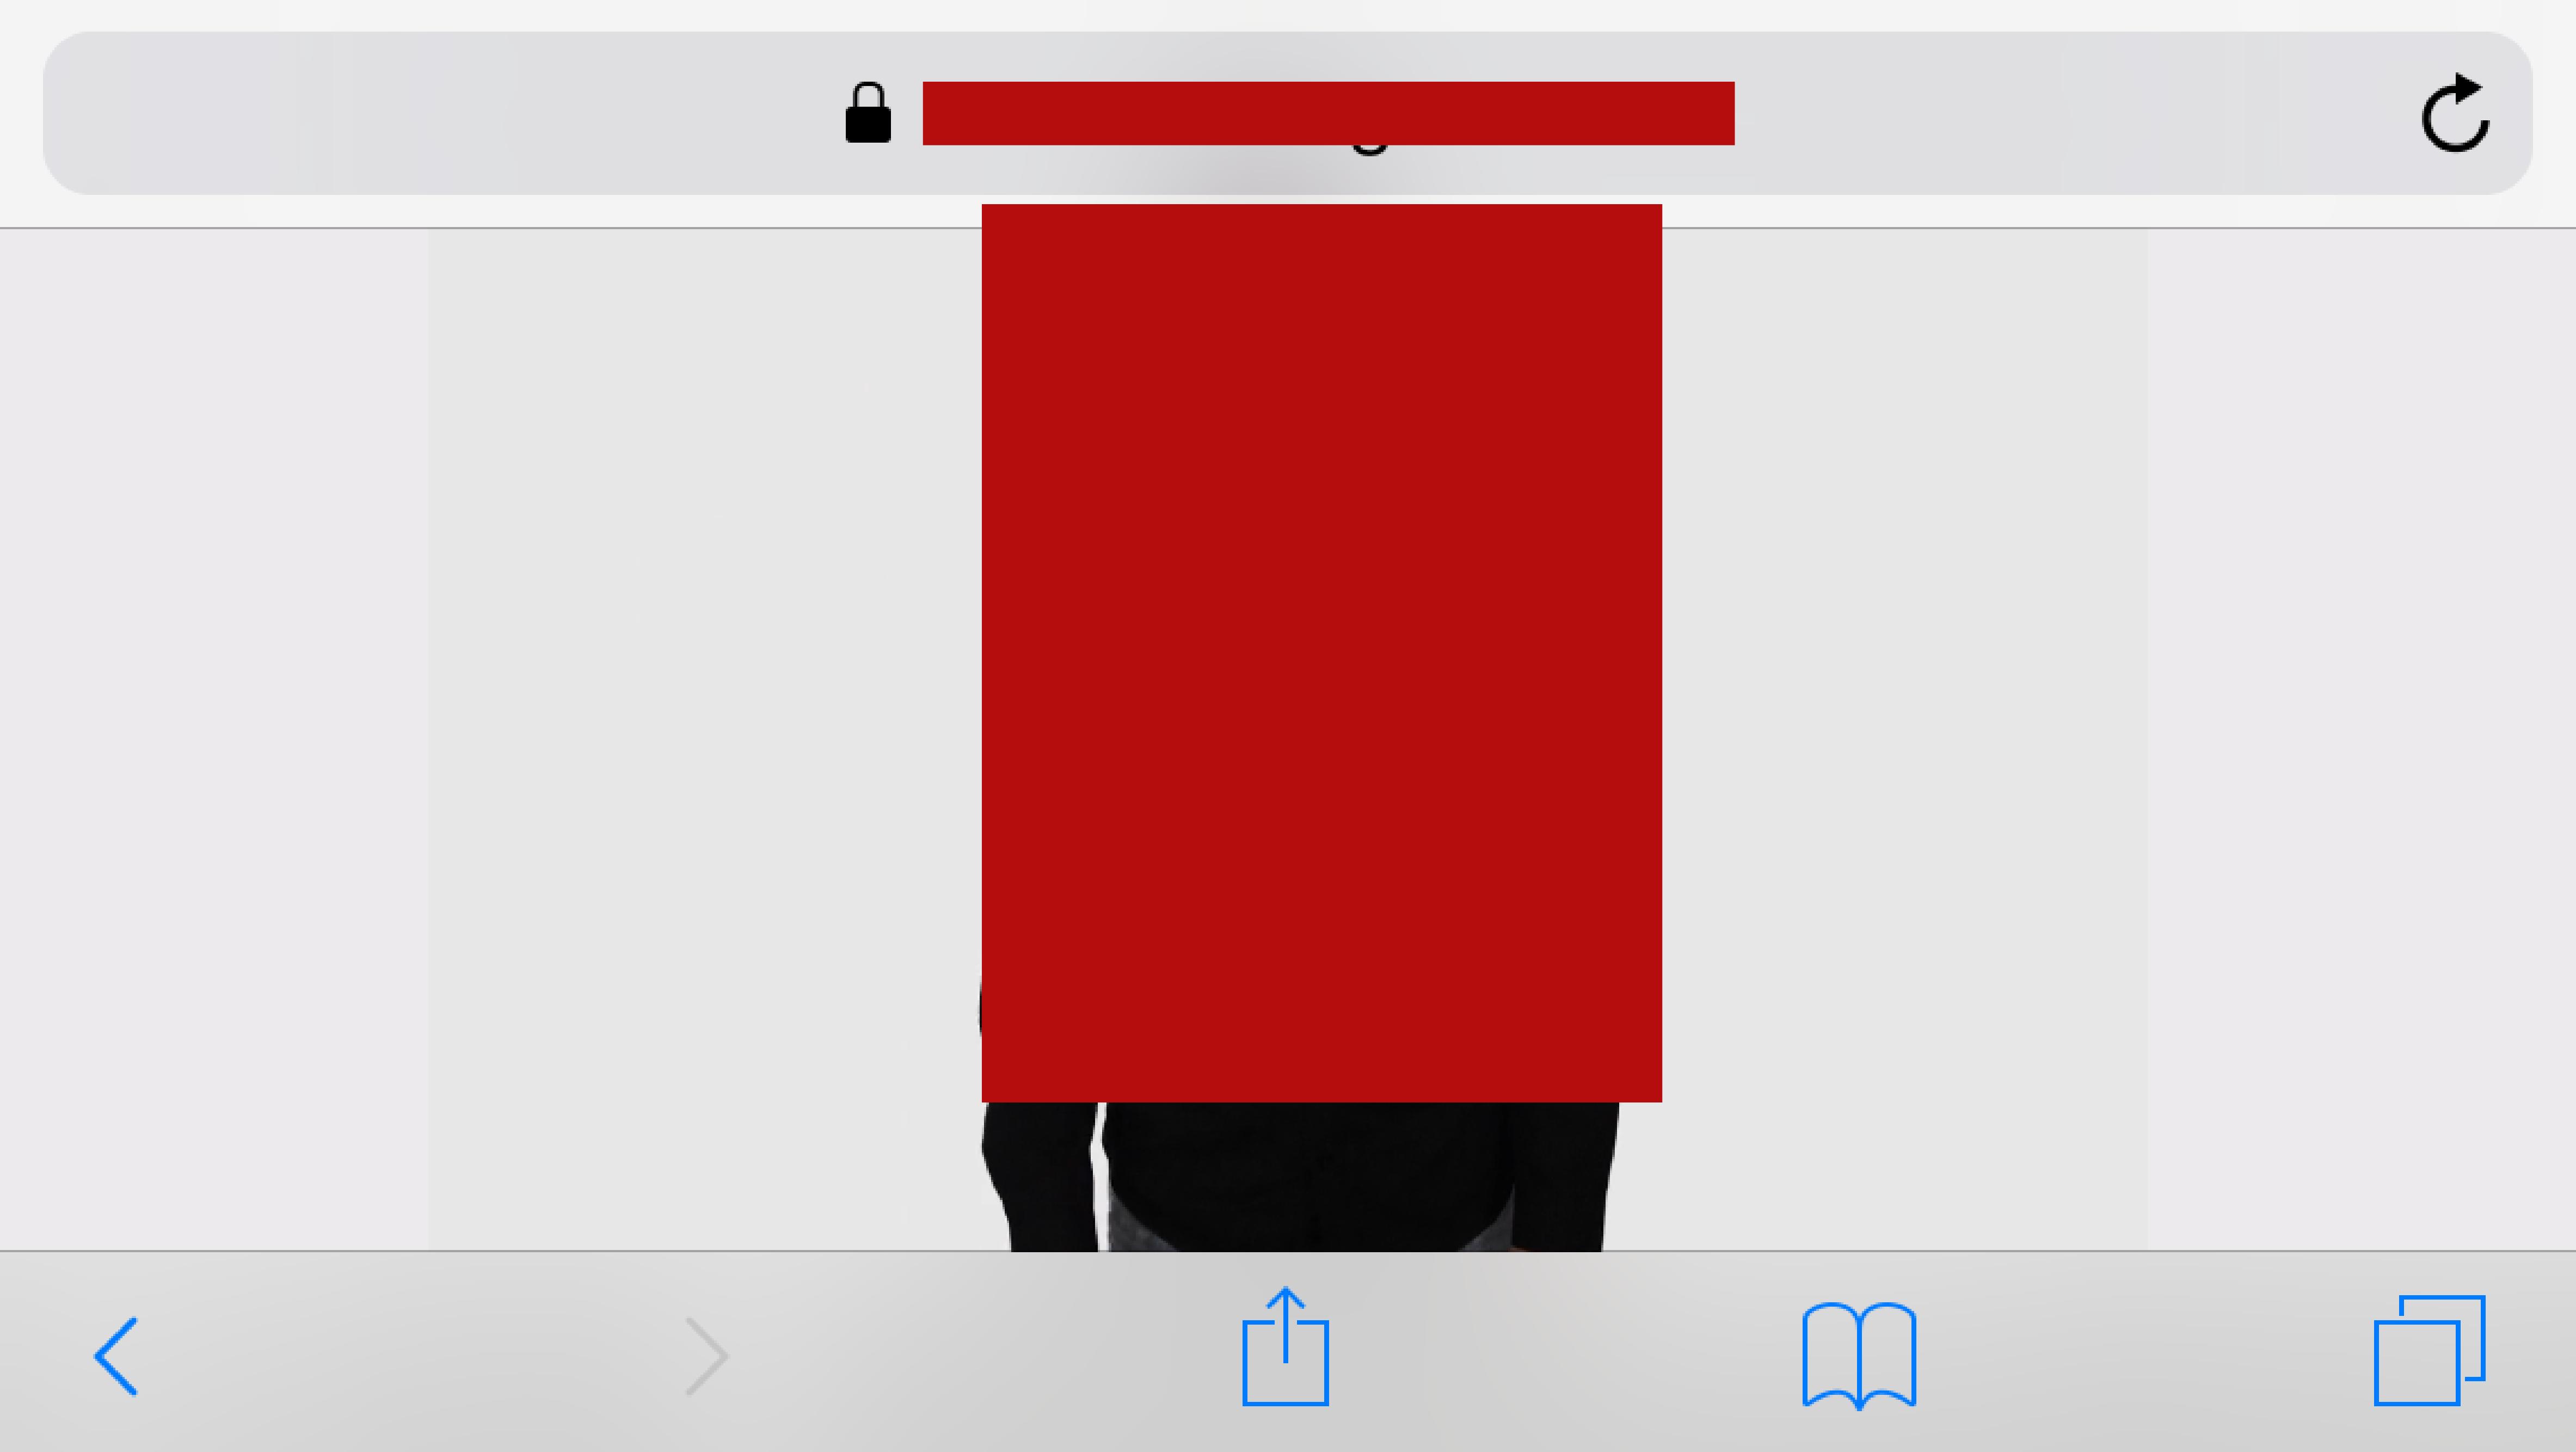 Interactive Video fullscreen mode on iOS has poor UX | H5P